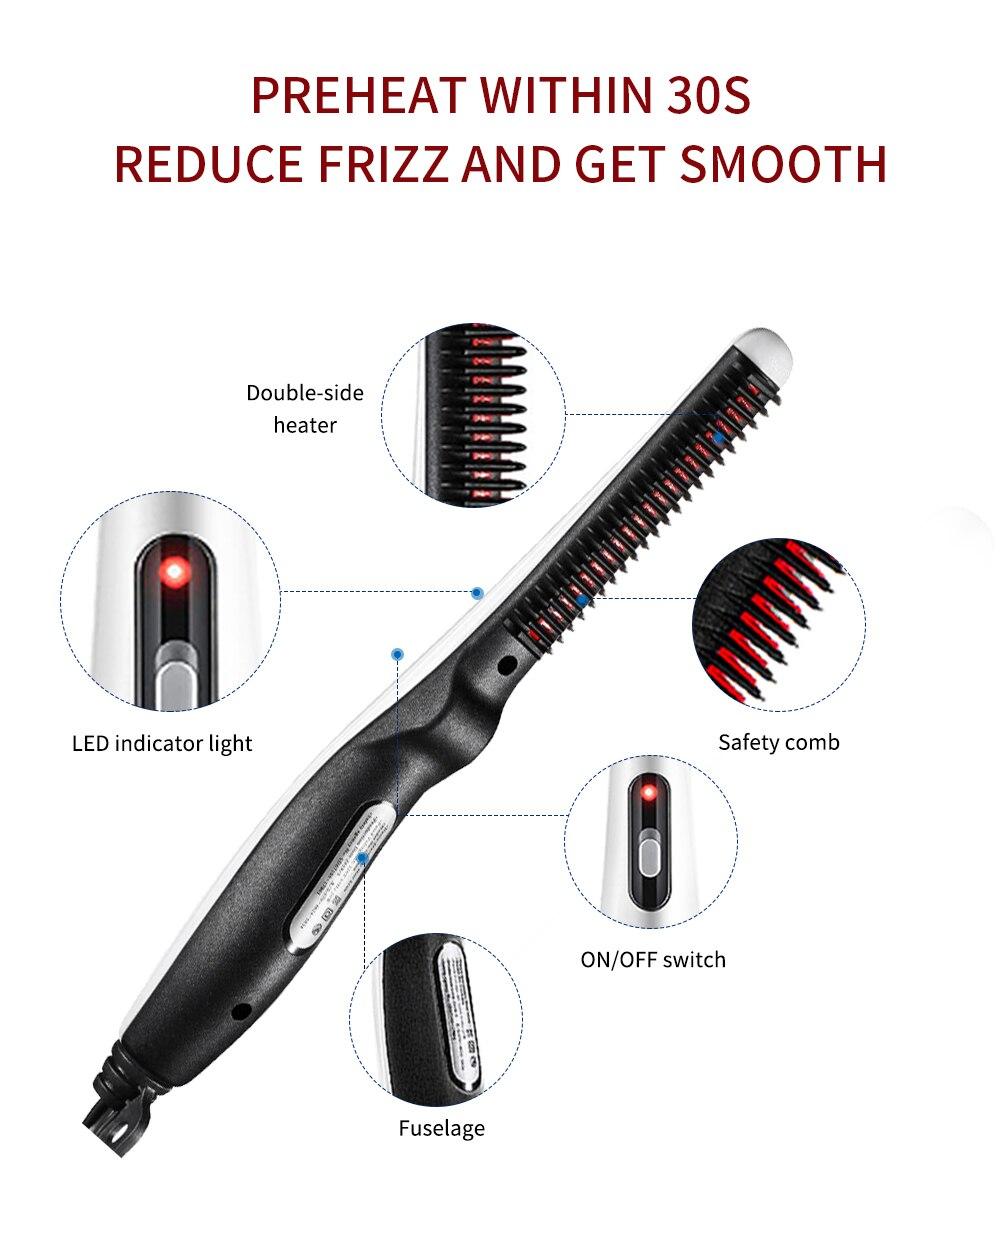 Quick Beard Straightener Hair Comb Multifunctional Hair  For Man Curler Show Cap Tool Electric Heating Hair Brush 9